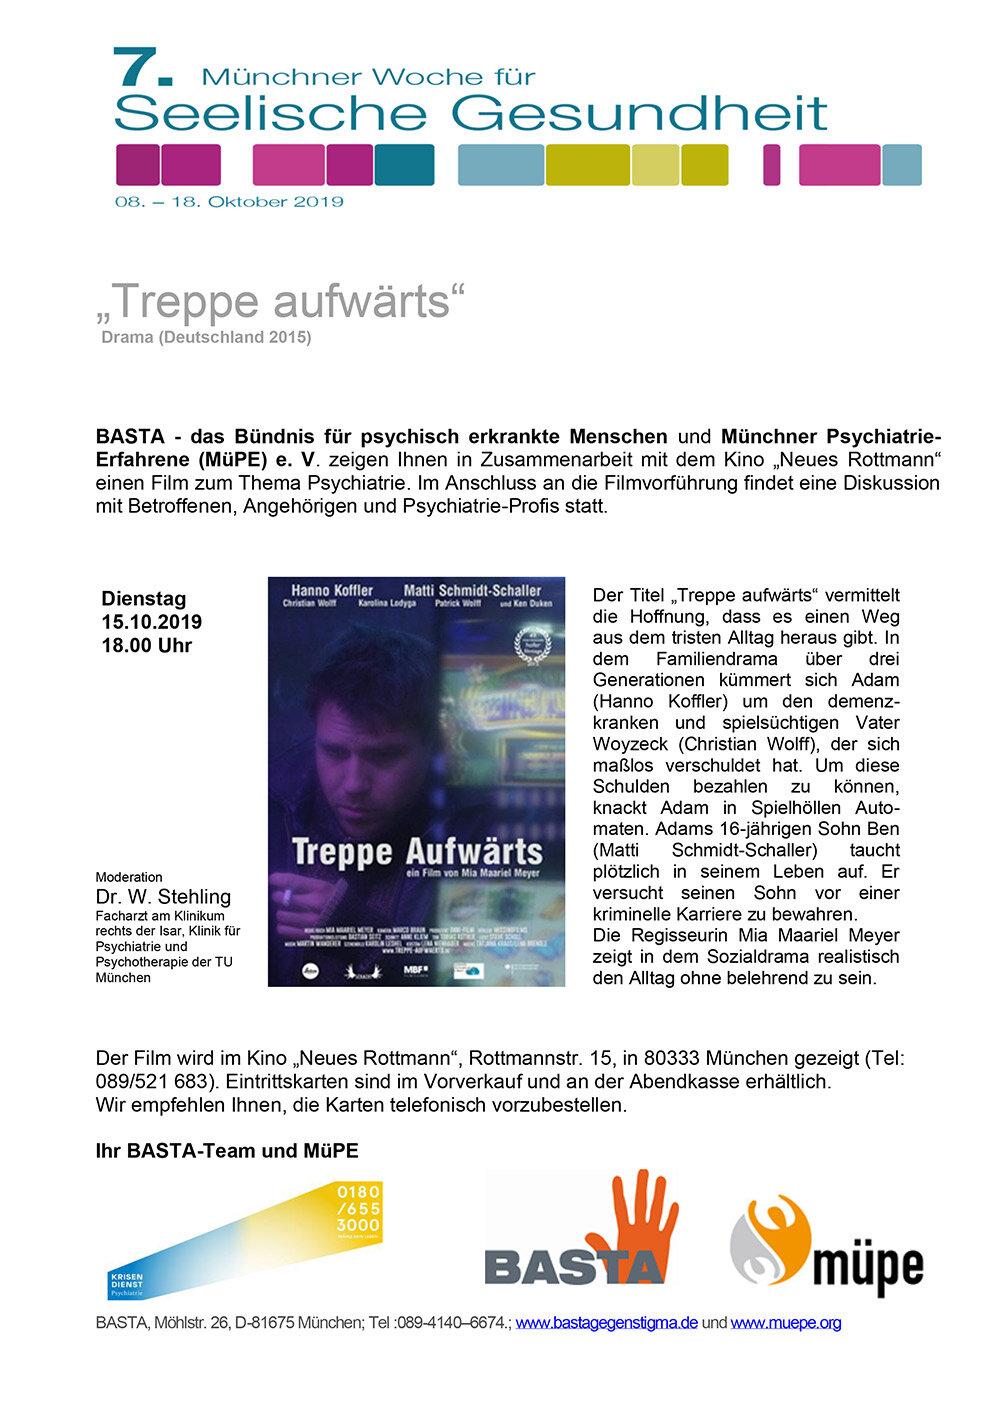 2019MWSG-Treppeaufwaerts1Muepe-2.jpg